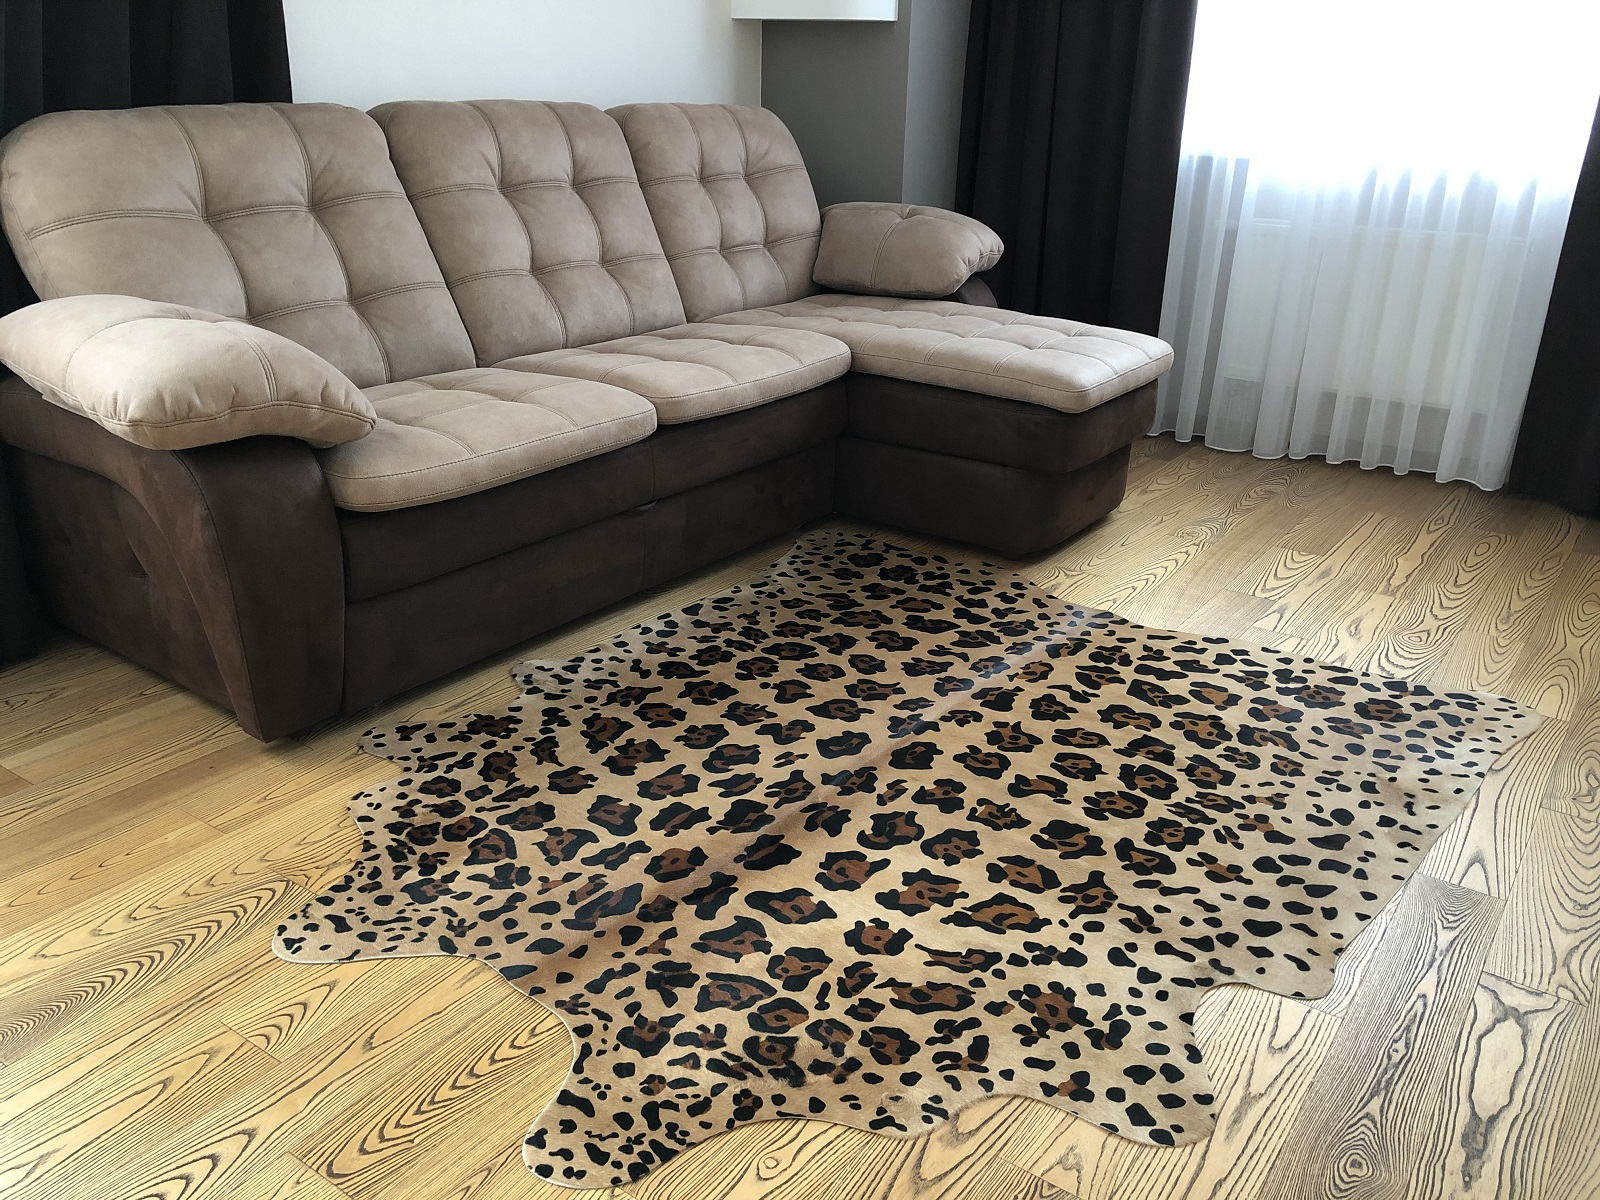 Шкура ягуара — коровья шкура крашеная 25236